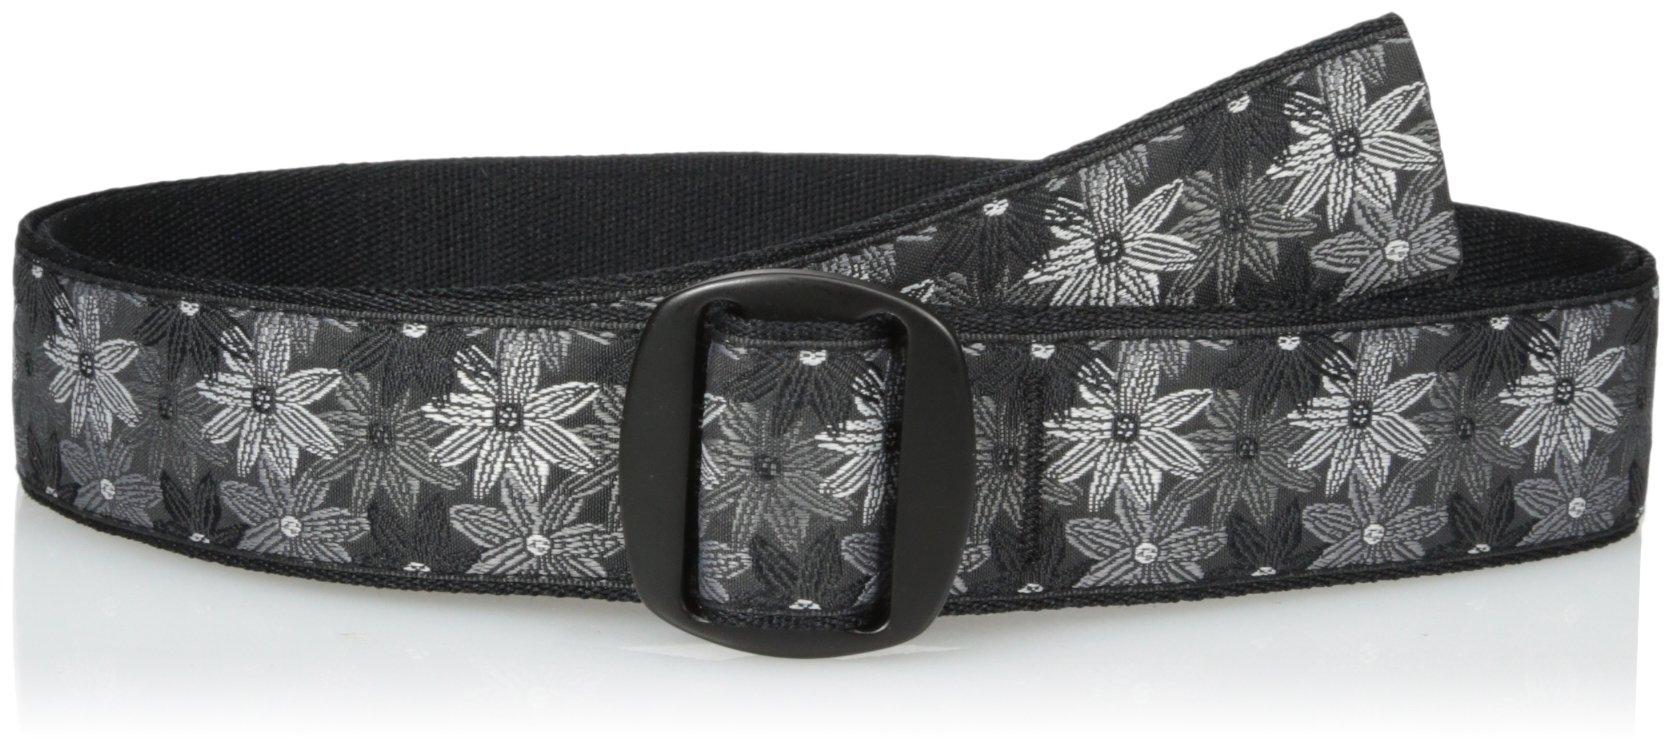 Bison Designs Women's Manzo Belt with Anodized Aluminum Buckle, Flower, Medium/38-Inch